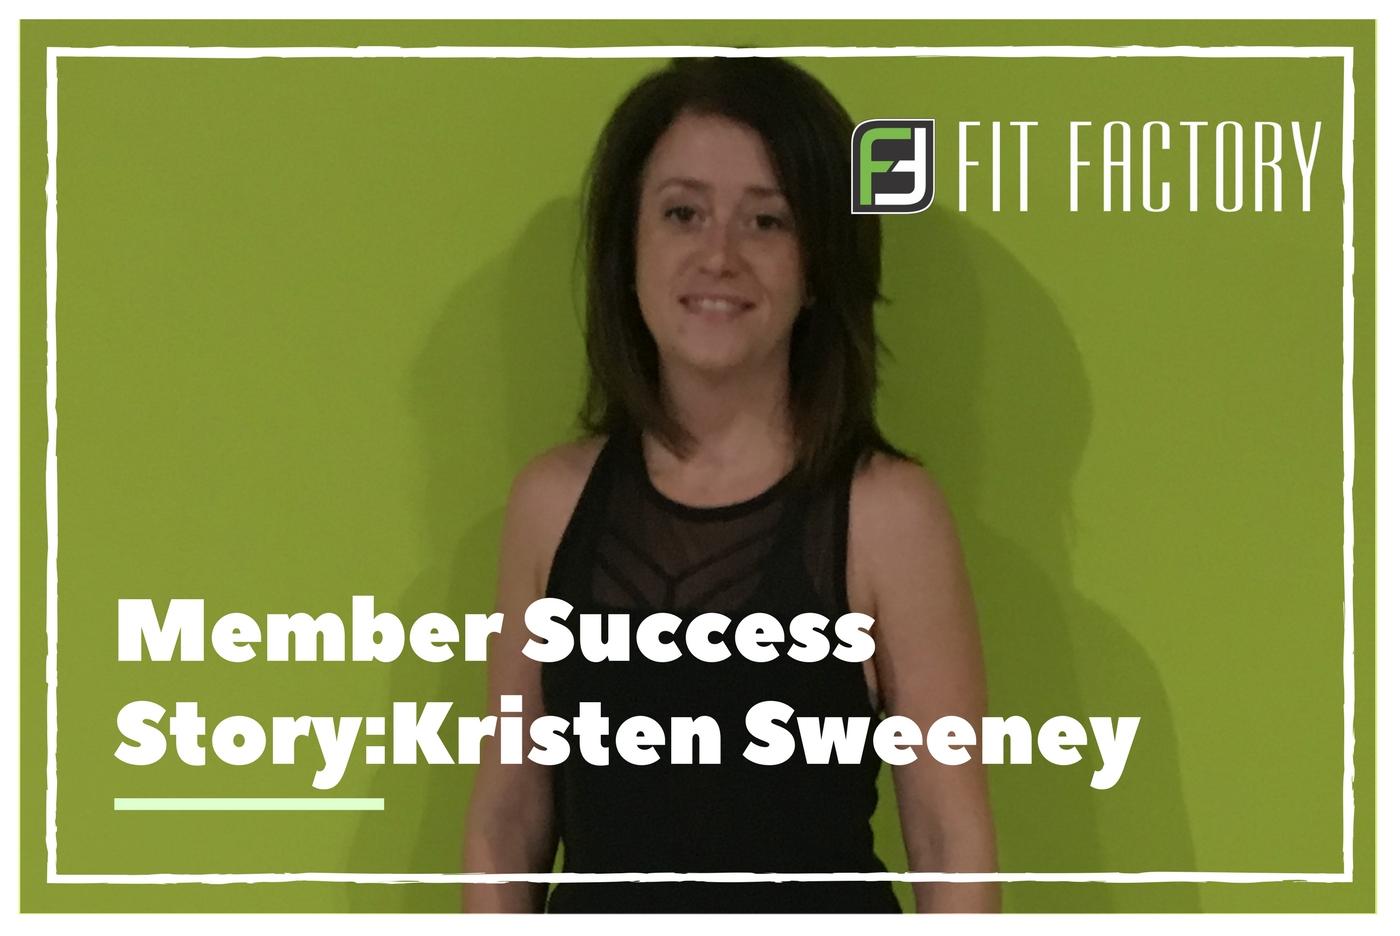 Member Success Story: Kristen Sweeney